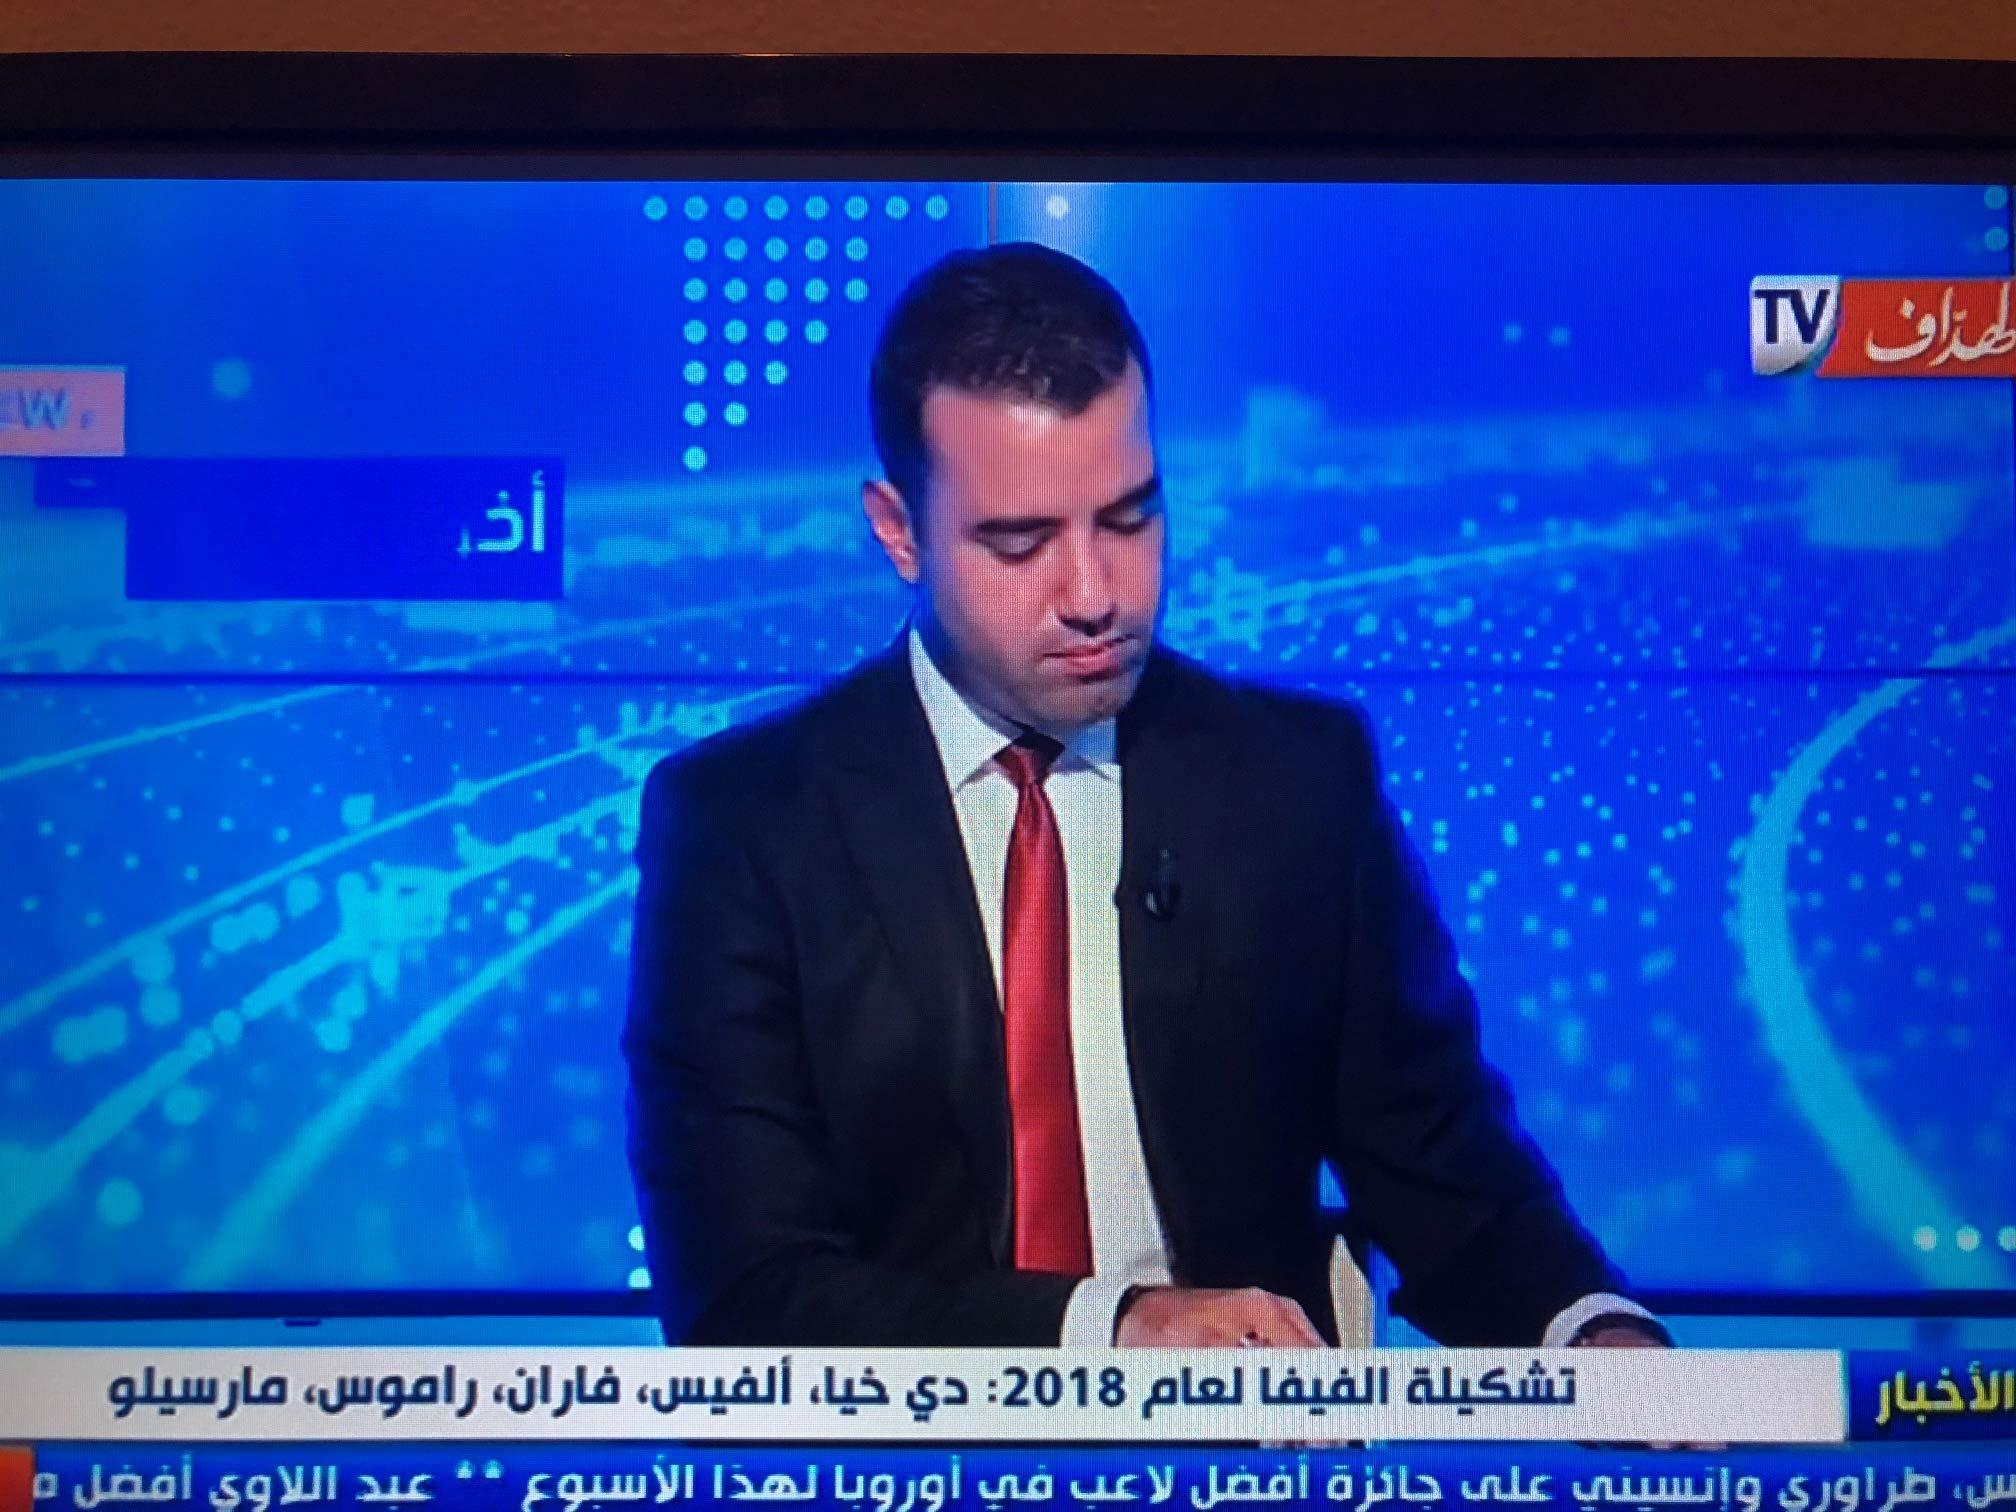 Arabic TV Super HD Receiver with 3000 Channels الأخبار والرياضة والبرامج العائلية by Media Solutions